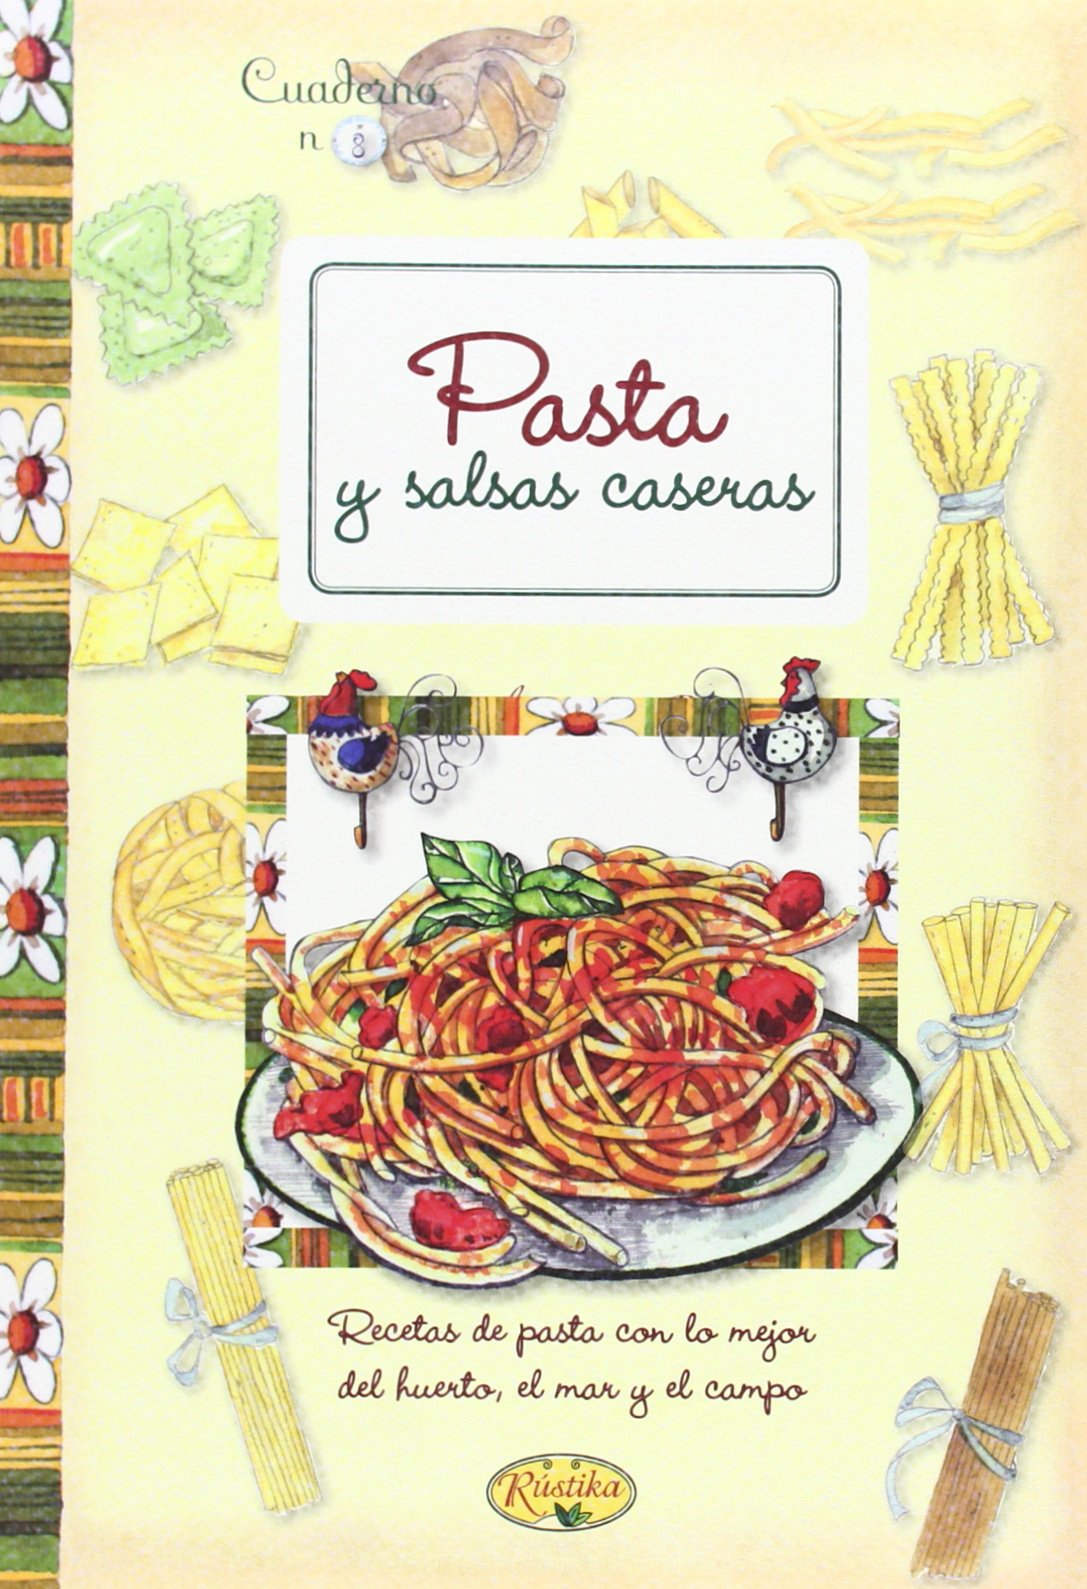 Pasta Y Salsas Caseras (Cuadernos de cocina): Amazon.es: Rústika, Selene Conti, Francesca Mazzini, Giulia Pianigiani, Mario Stoppele, Laura Toffaletti: ...